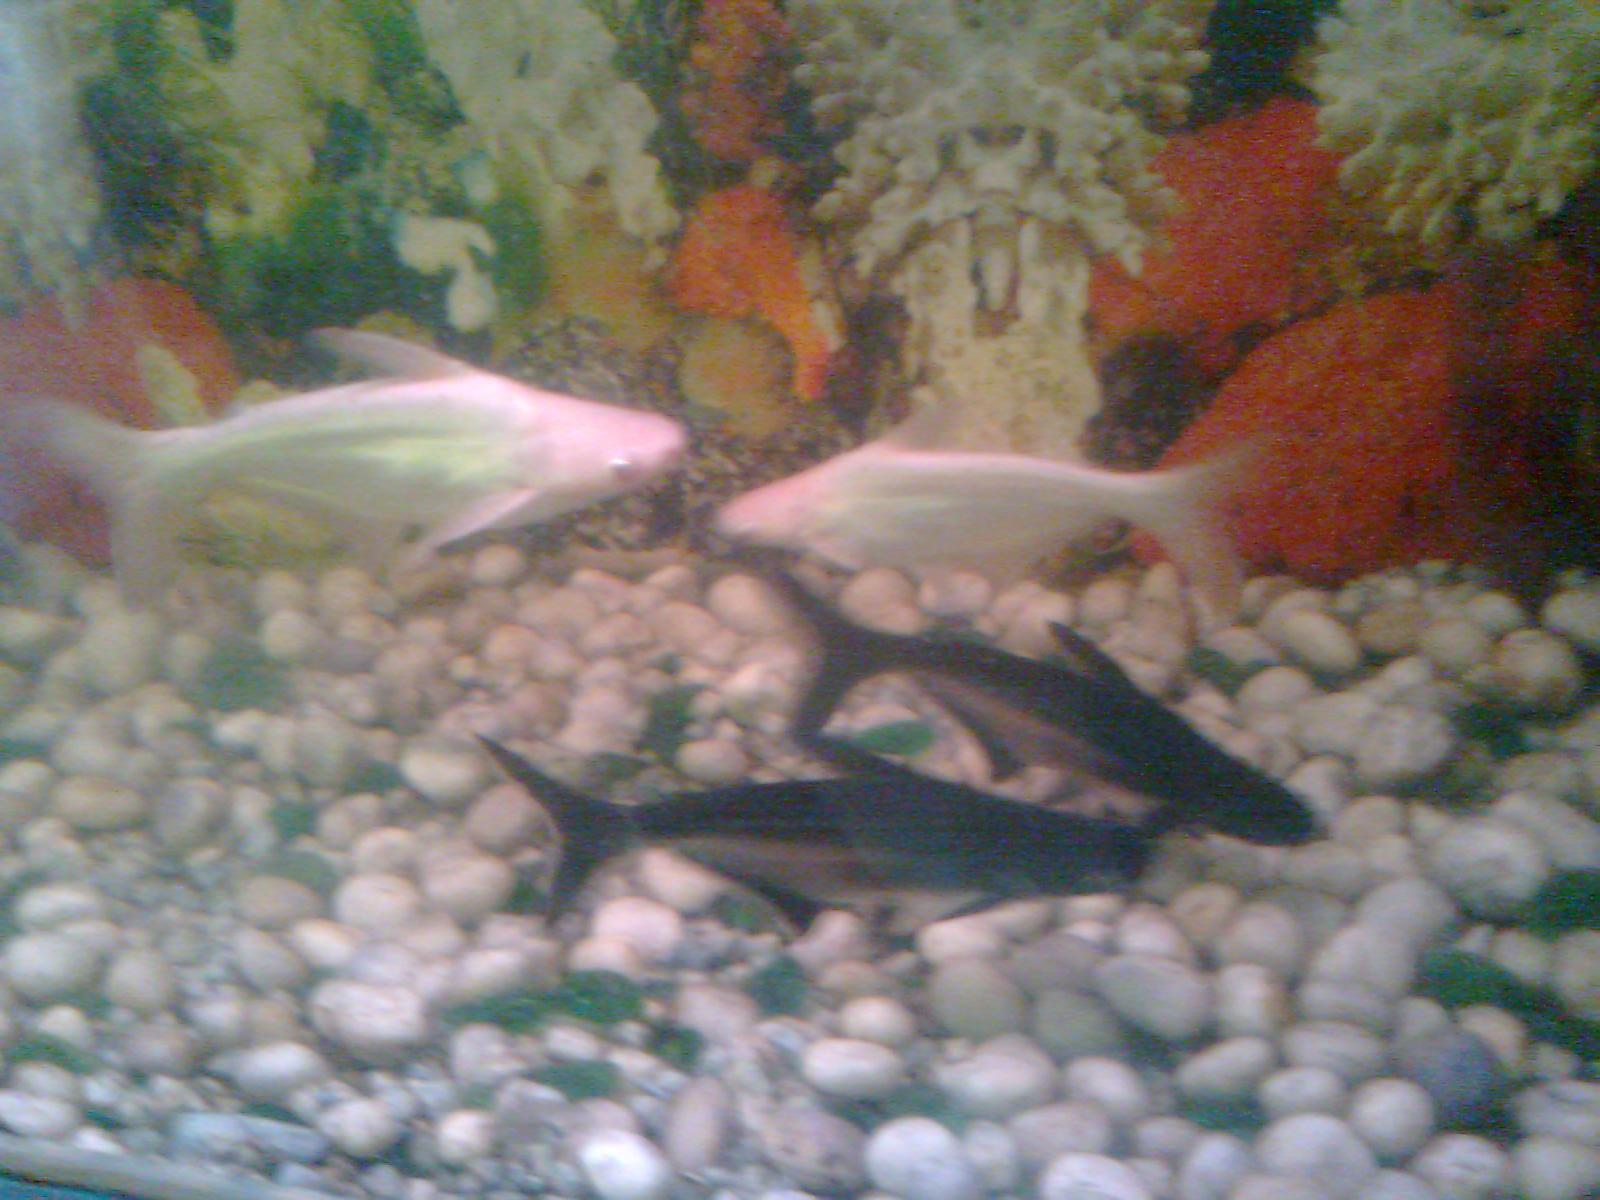 Fish aquarium in bhopal - Hundreds Of Children Visit Machli Ghar Daily To See Rare Tropical Fishes In This Fish Aquarium